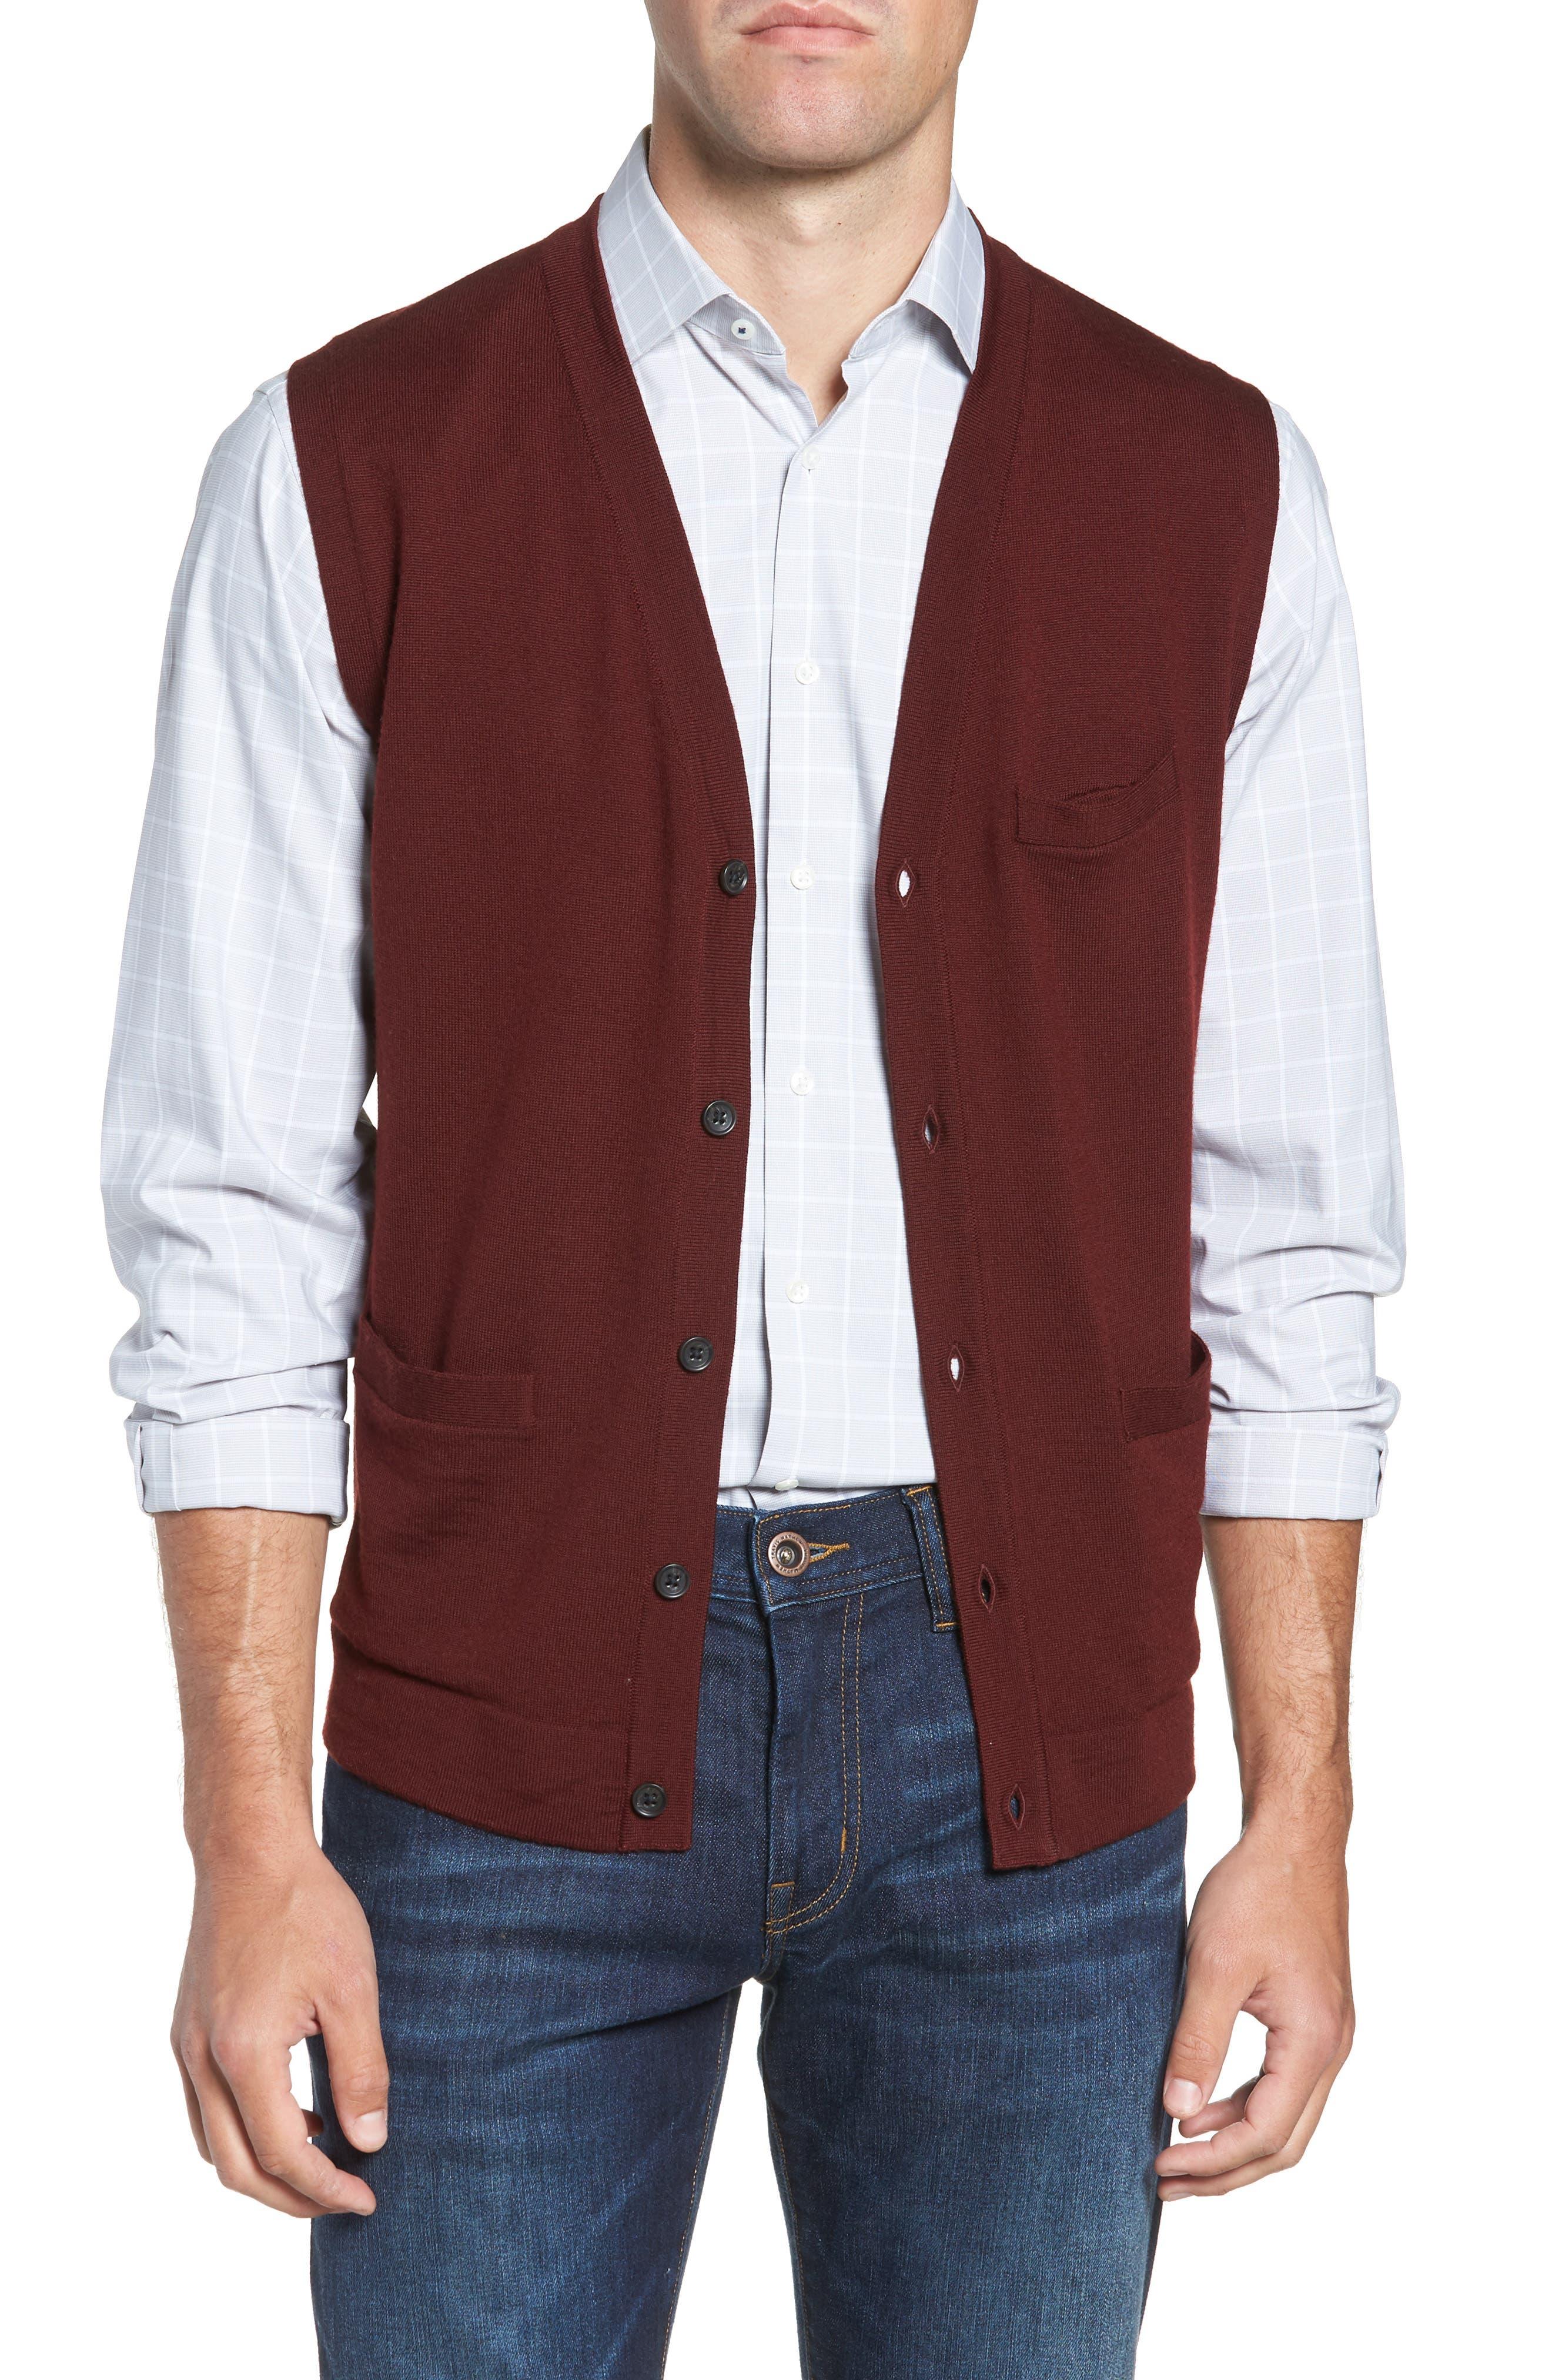 Merino Button Front Sweater Vest,                             Alternate thumbnail 5, color,                             Burgundy Royale